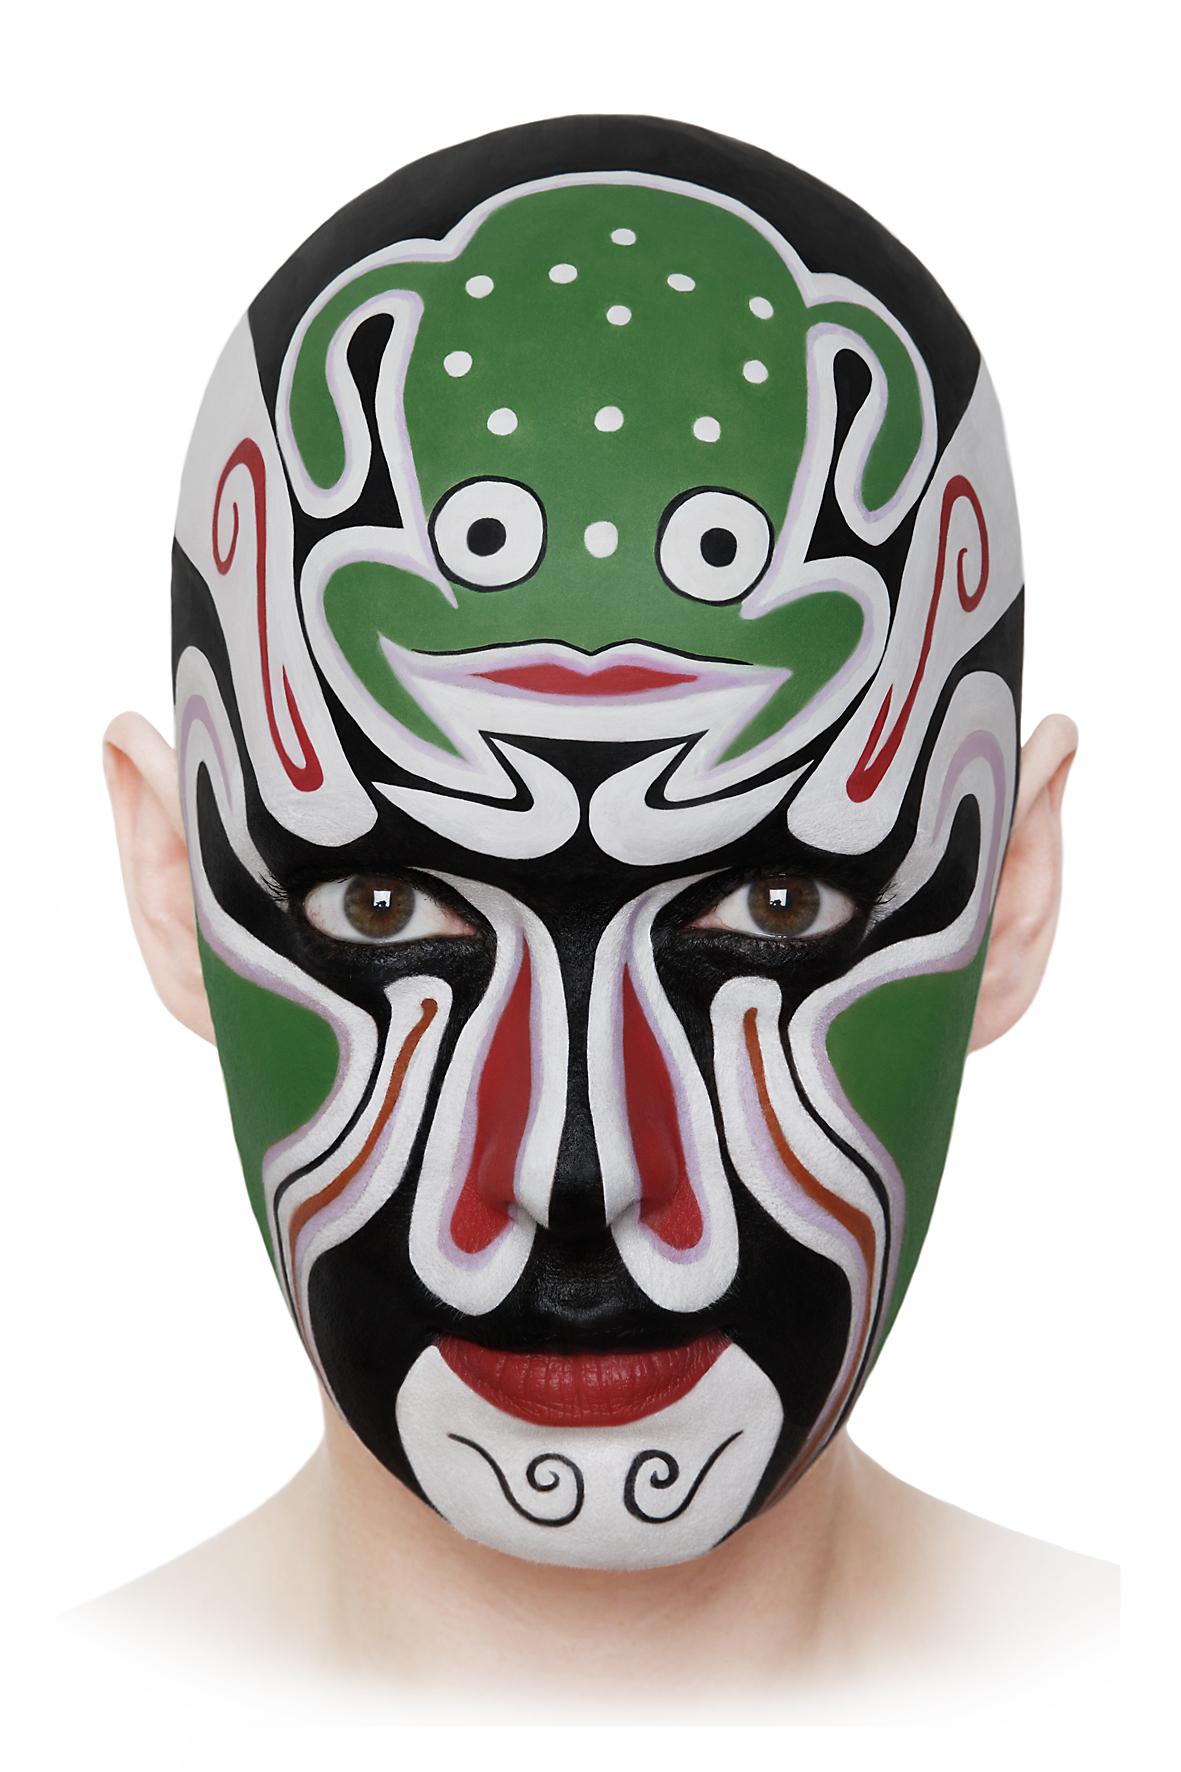 Geiles Globales Gesicht # 11,  2008, self-portrait, lambda print, 80 cm x 120 cm.